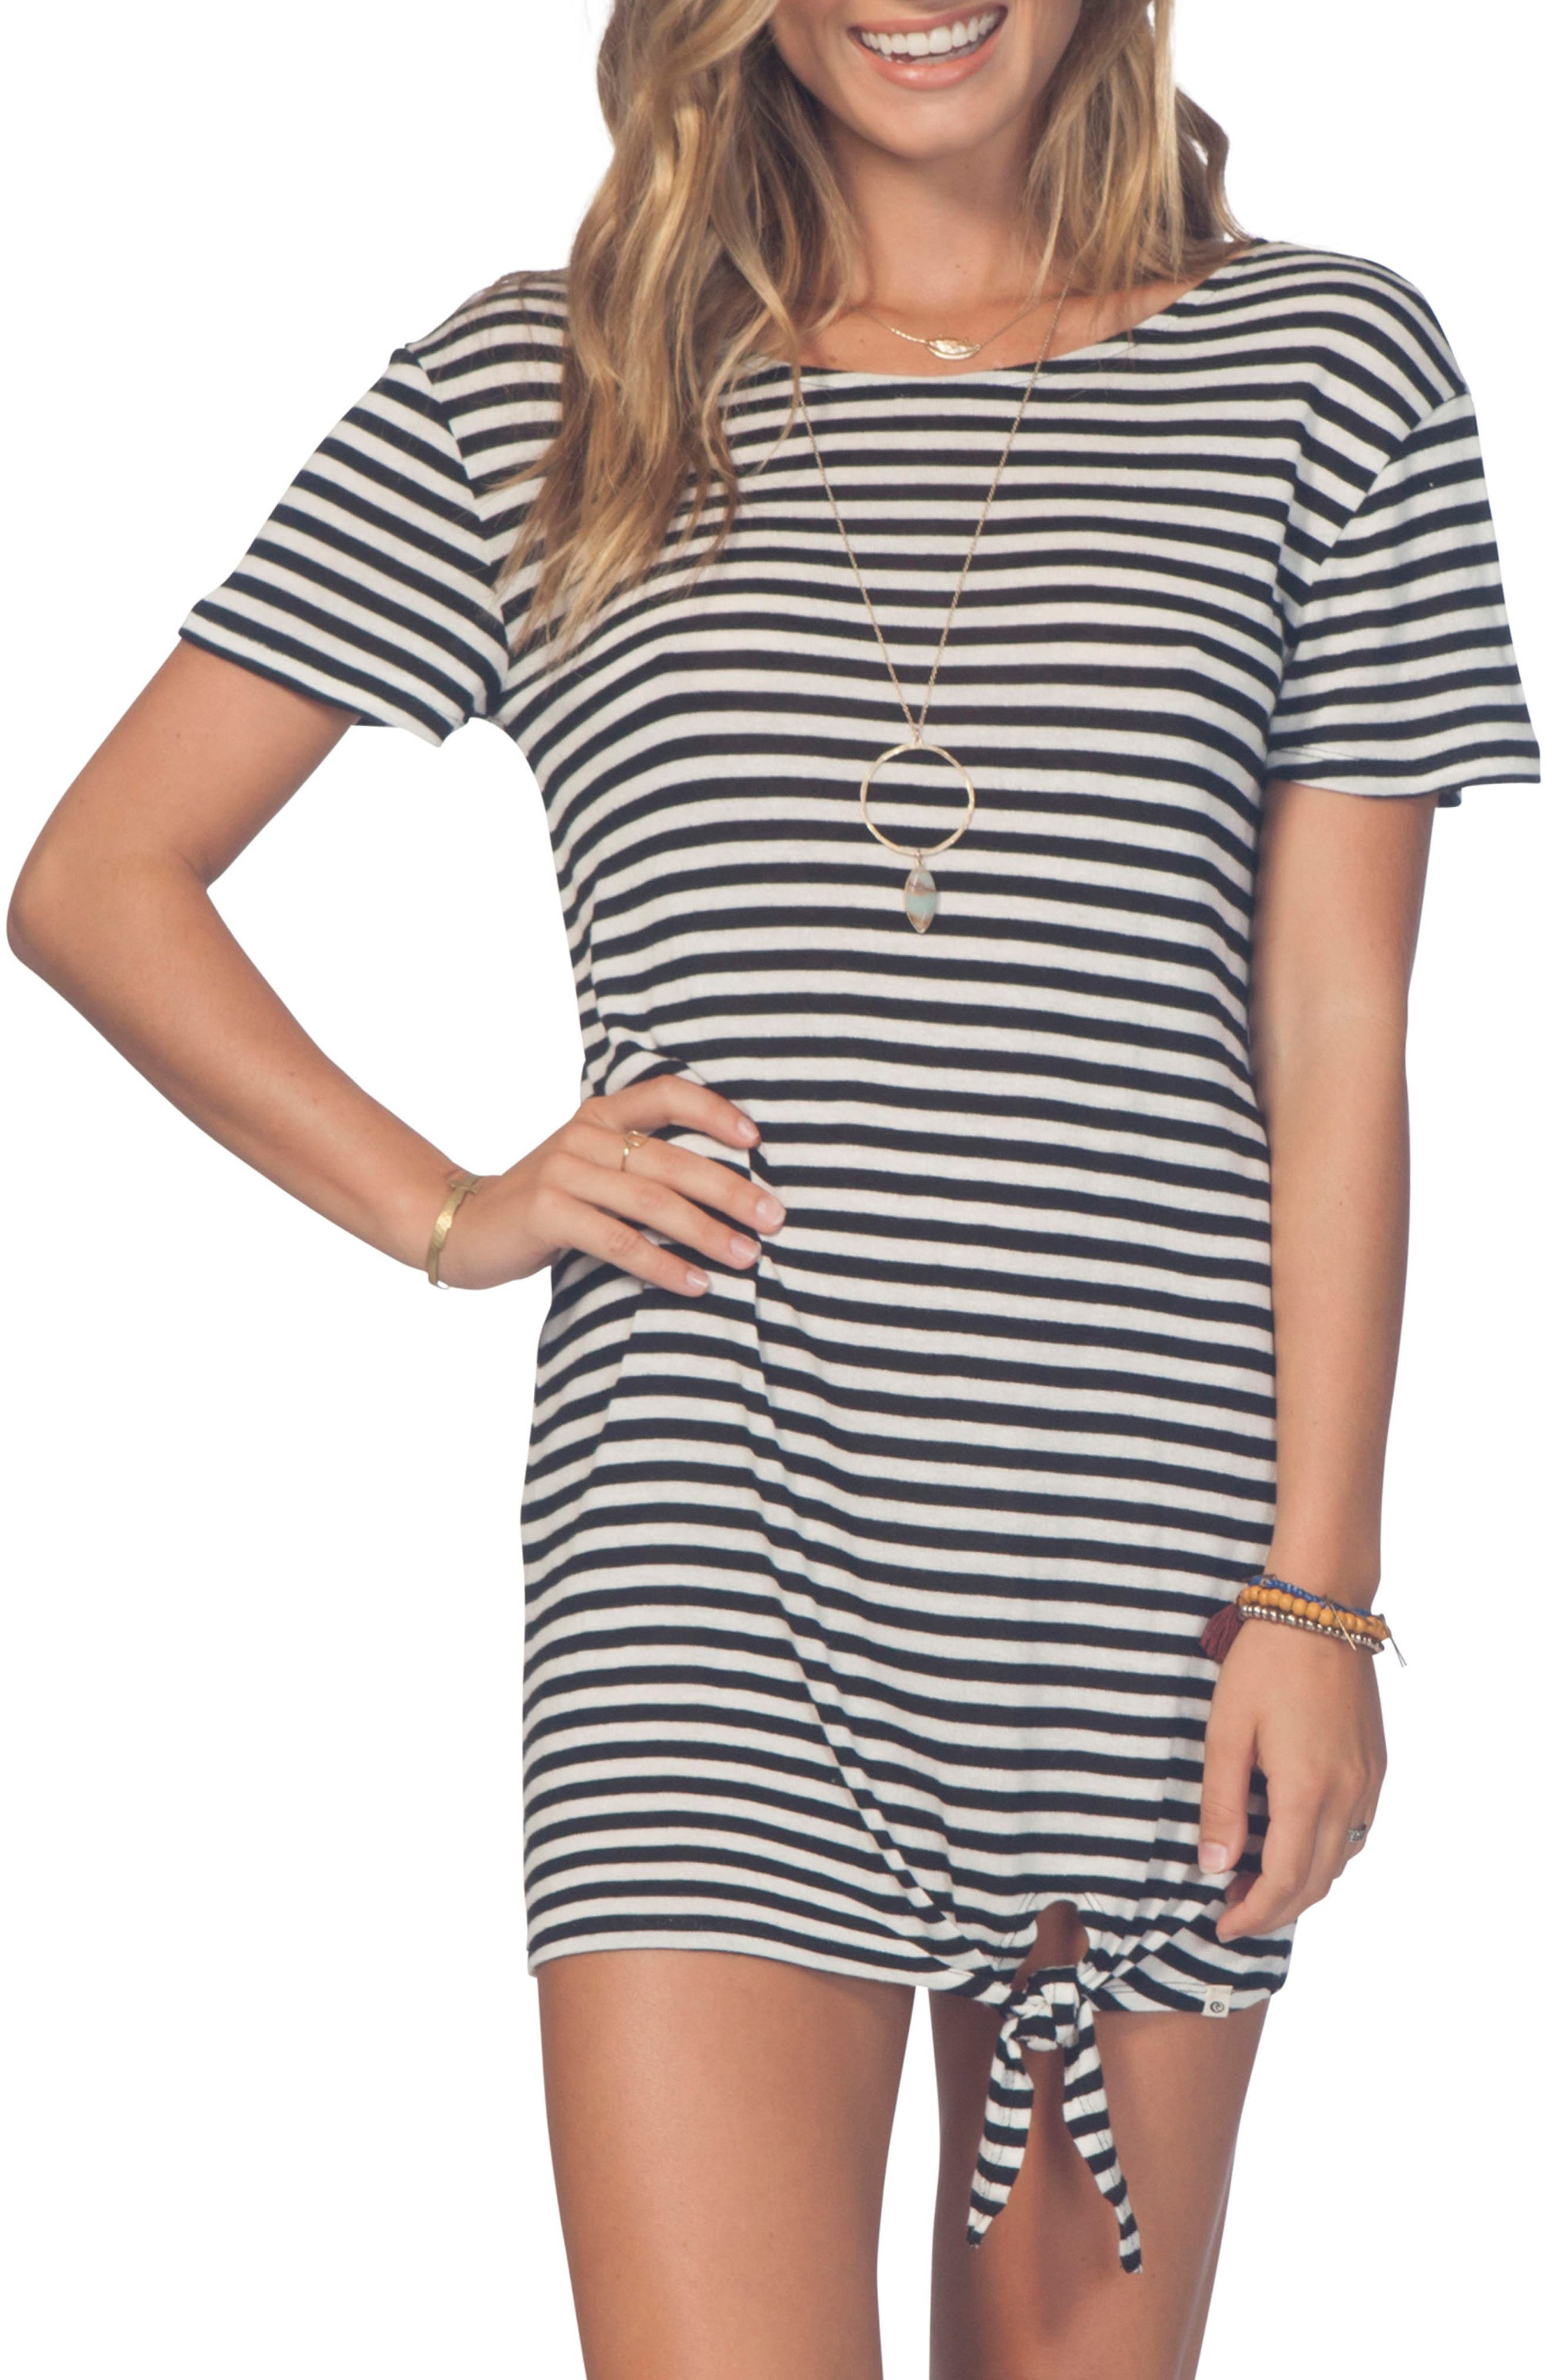 Premium Surf T-Shirt Dress,                             Main thumbnail 1, color,                             Black/ White